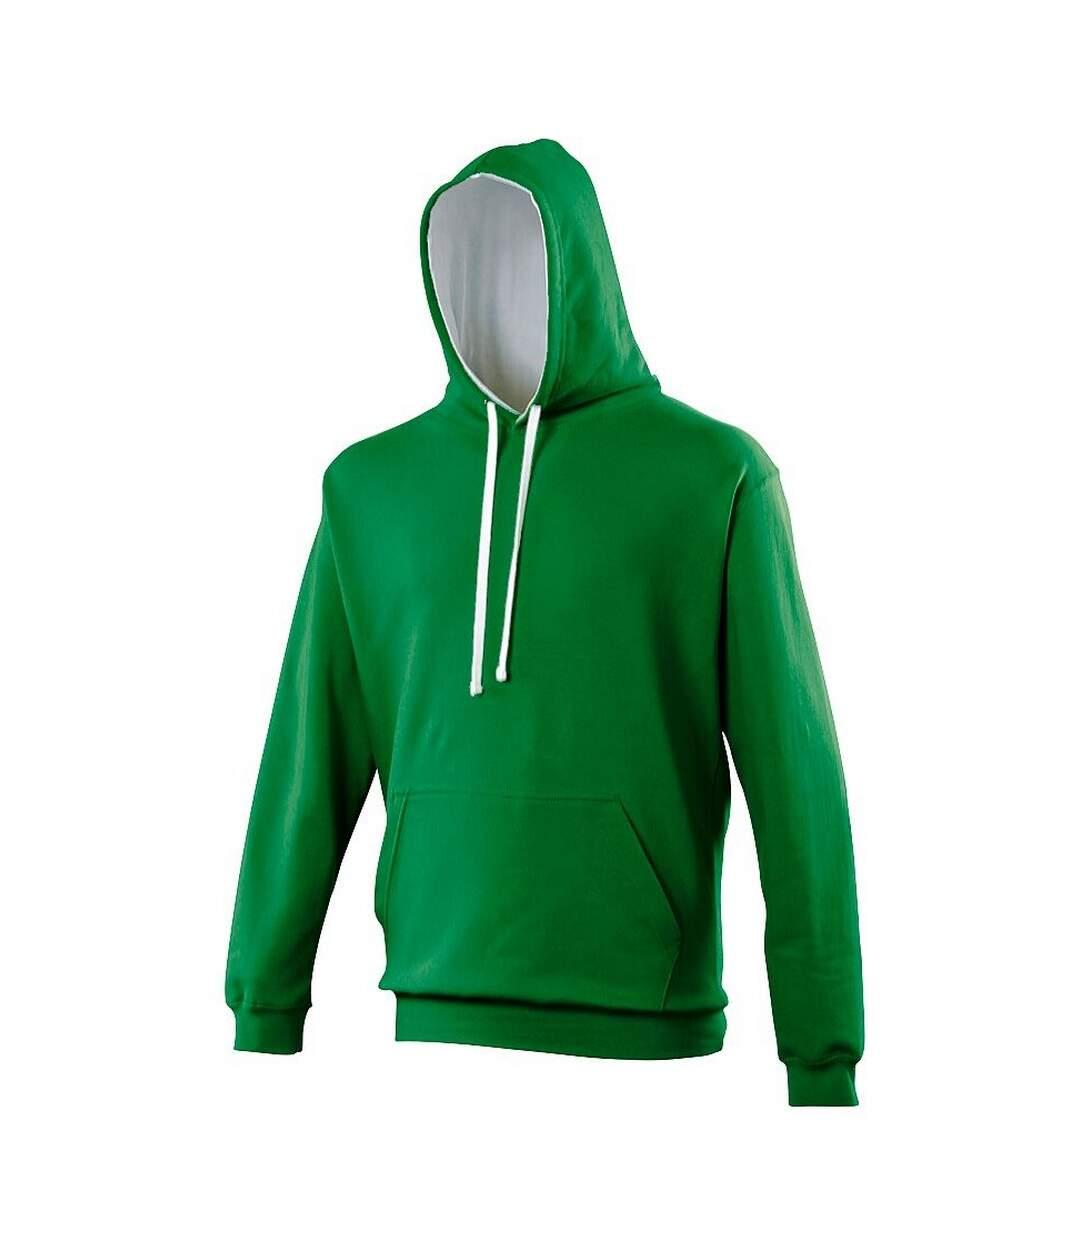 Awdis Varsity Hooded Sweatshirt / Hoodie (Kelly Green/Arctic White) - UTRW165